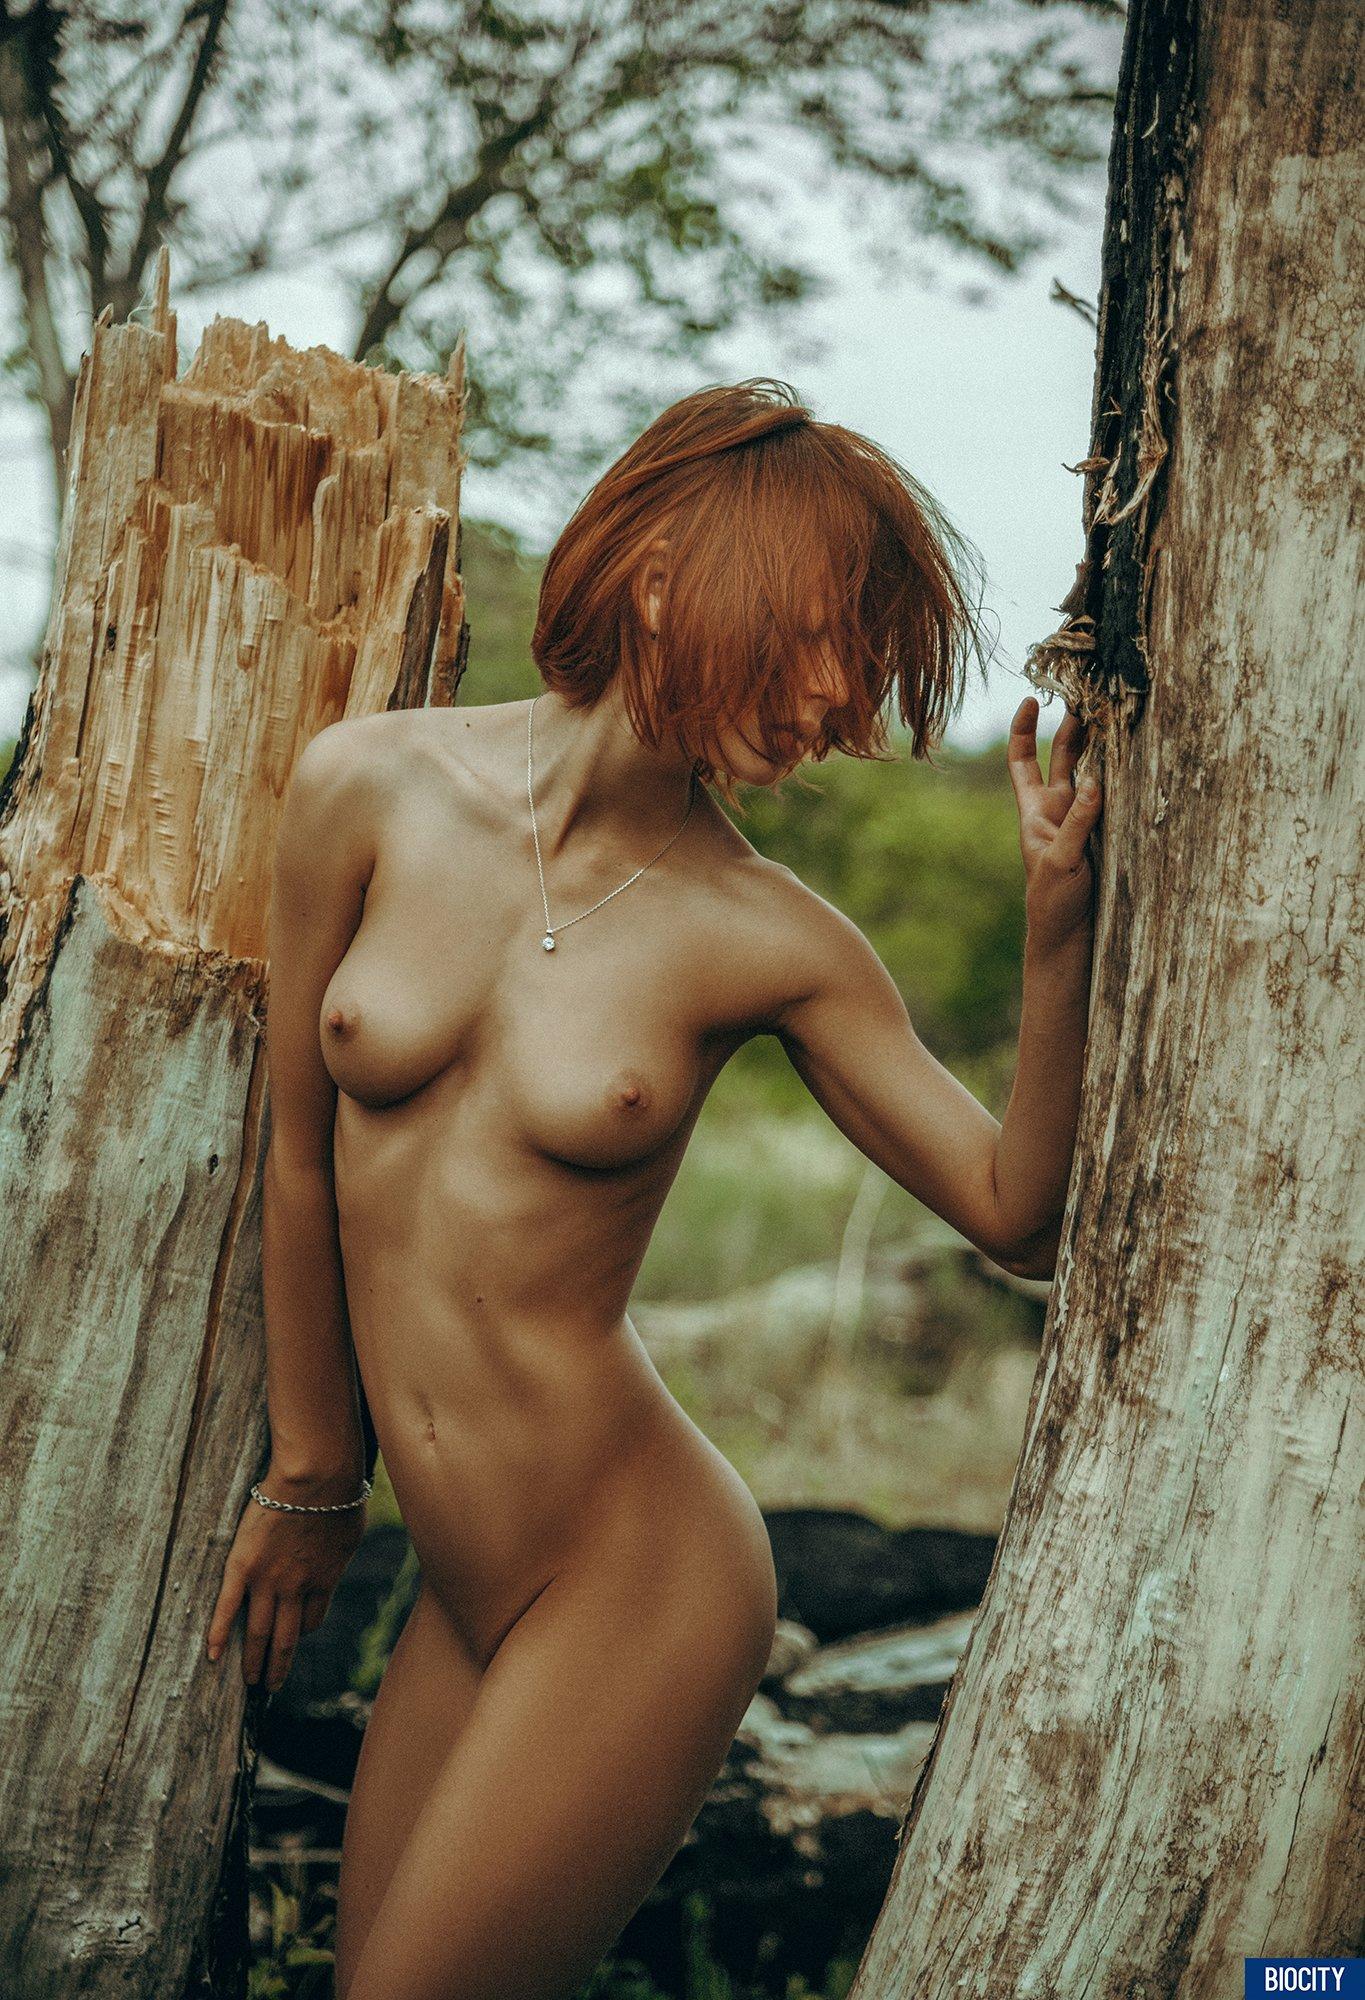 Beautiful, Biocity, BiocityMonte, Girl, Model, Nude, Portrait, Девушка, Модель, Ню, Пашакарпенко, Портрет, Biocity Monte